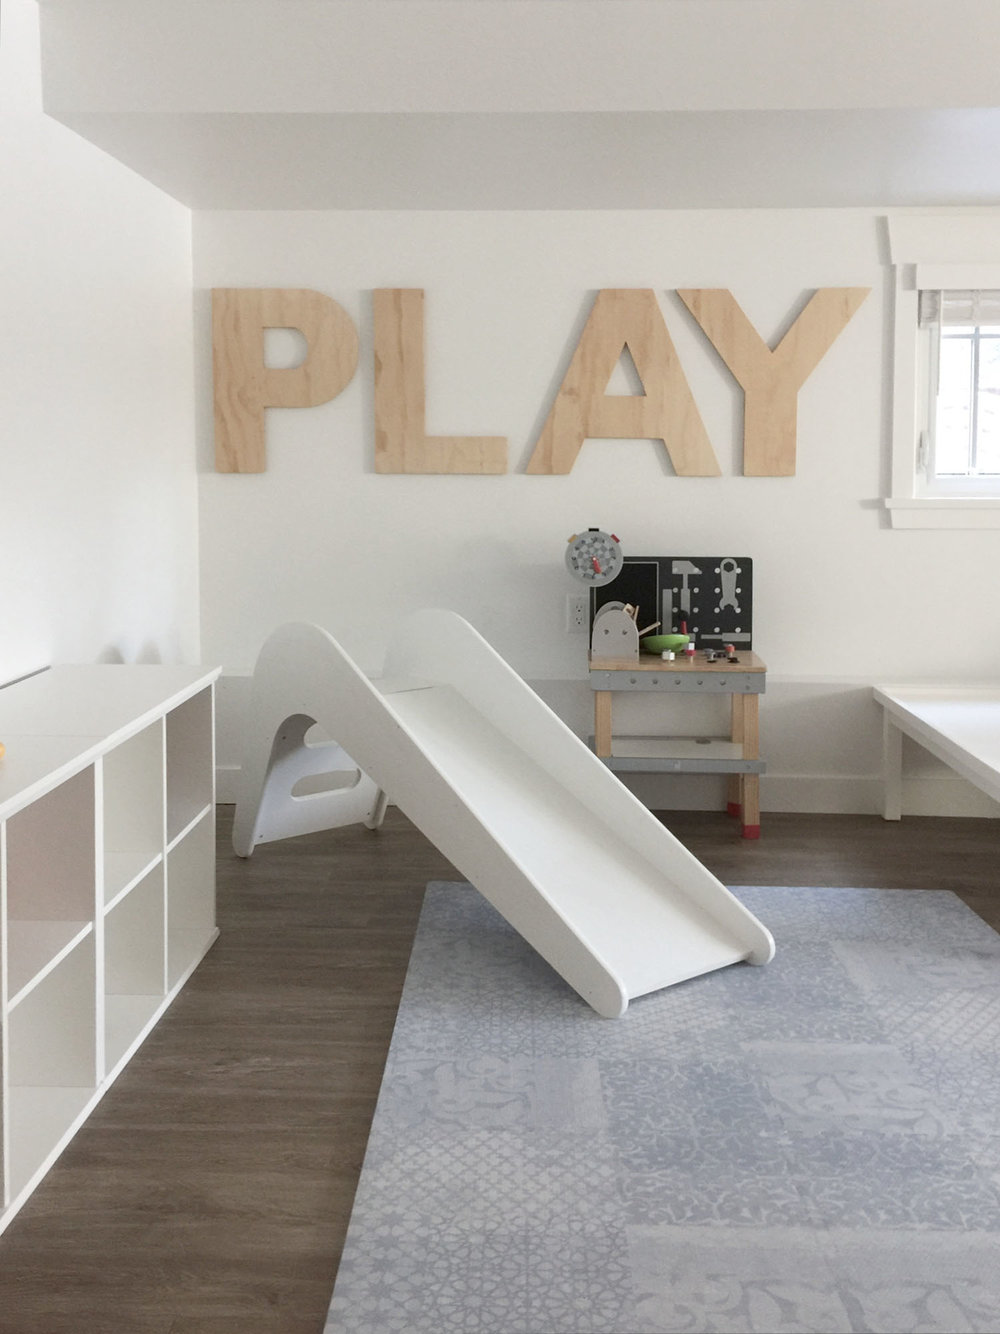 playroom in progress